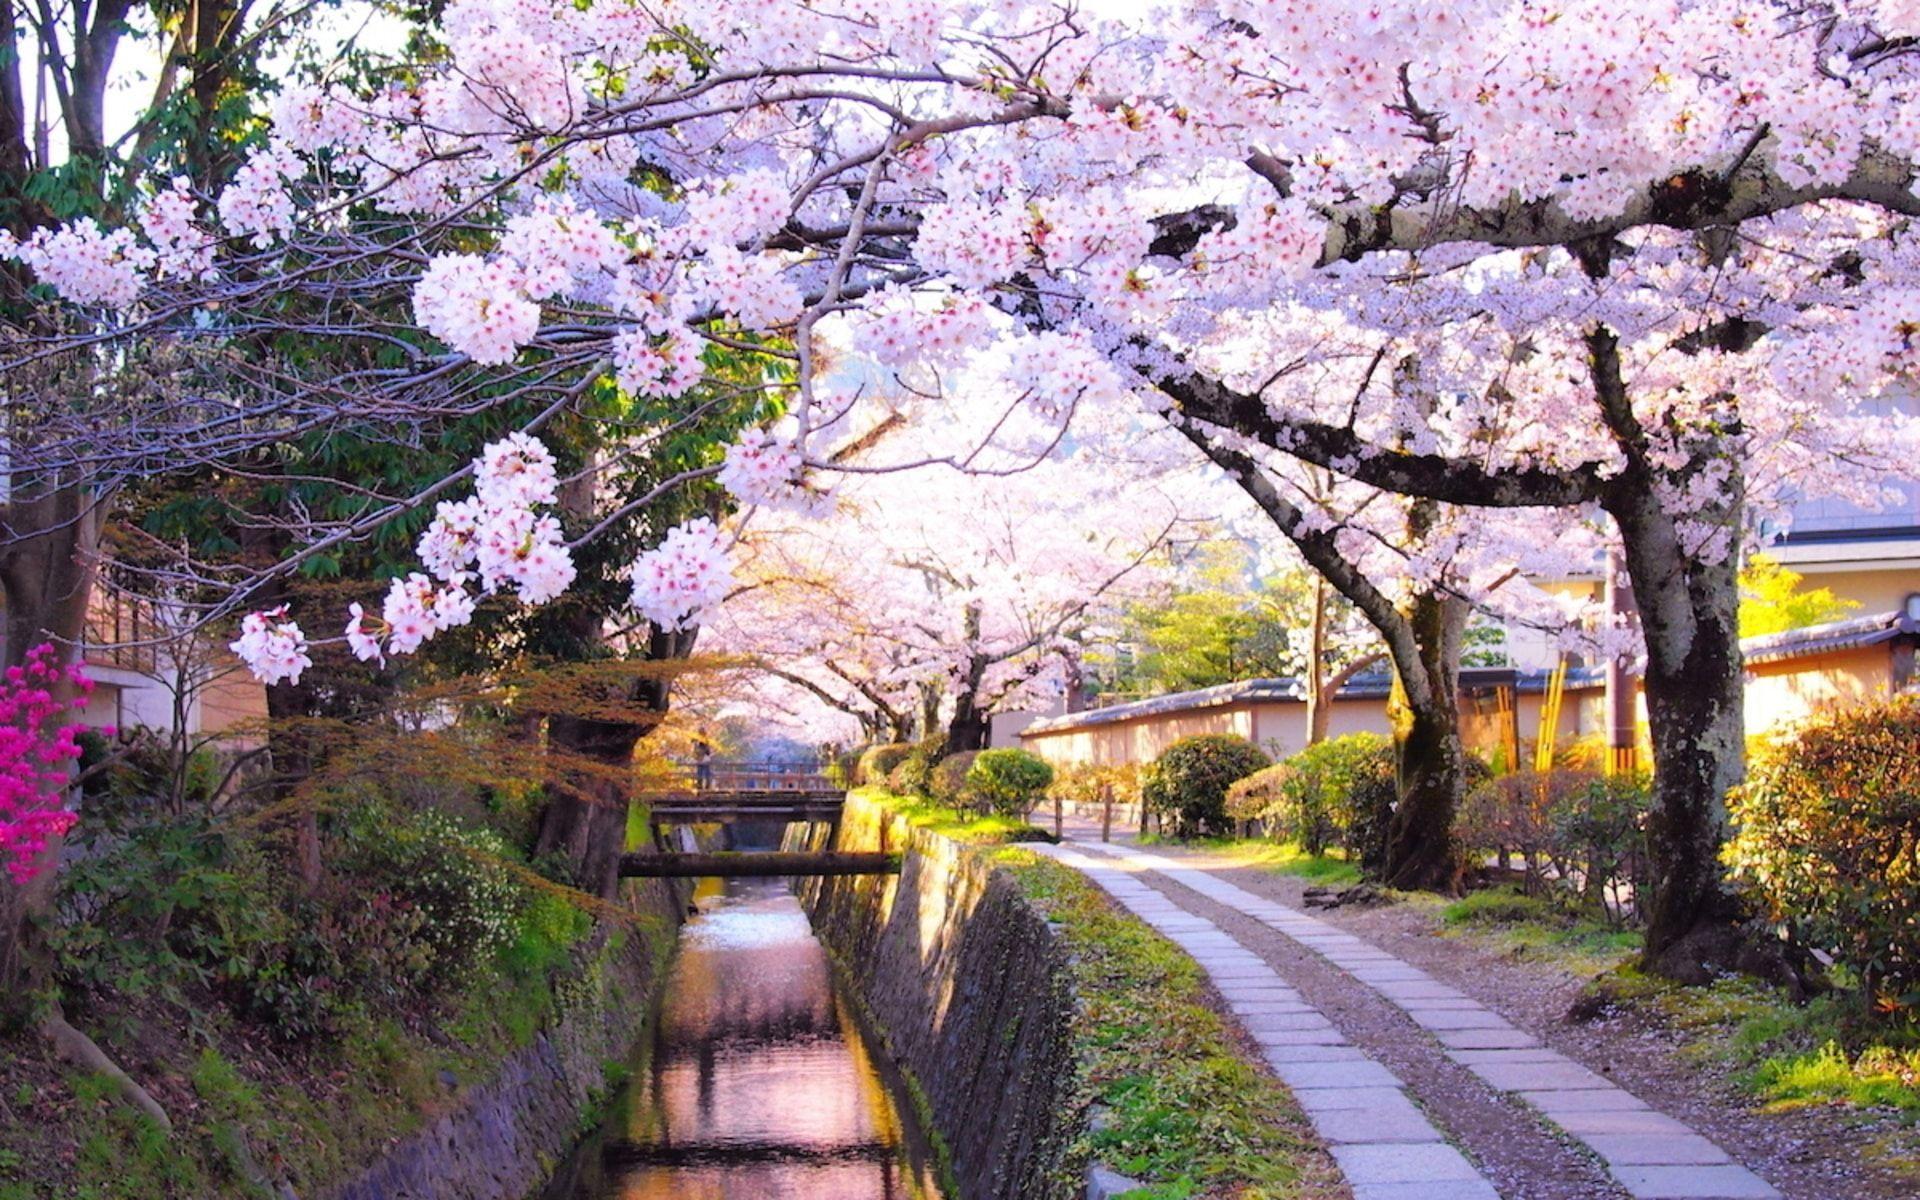 Image Result For Japan Cherry Blossom Japan Countryside Cherry Blossom Japan Kyoto Travel